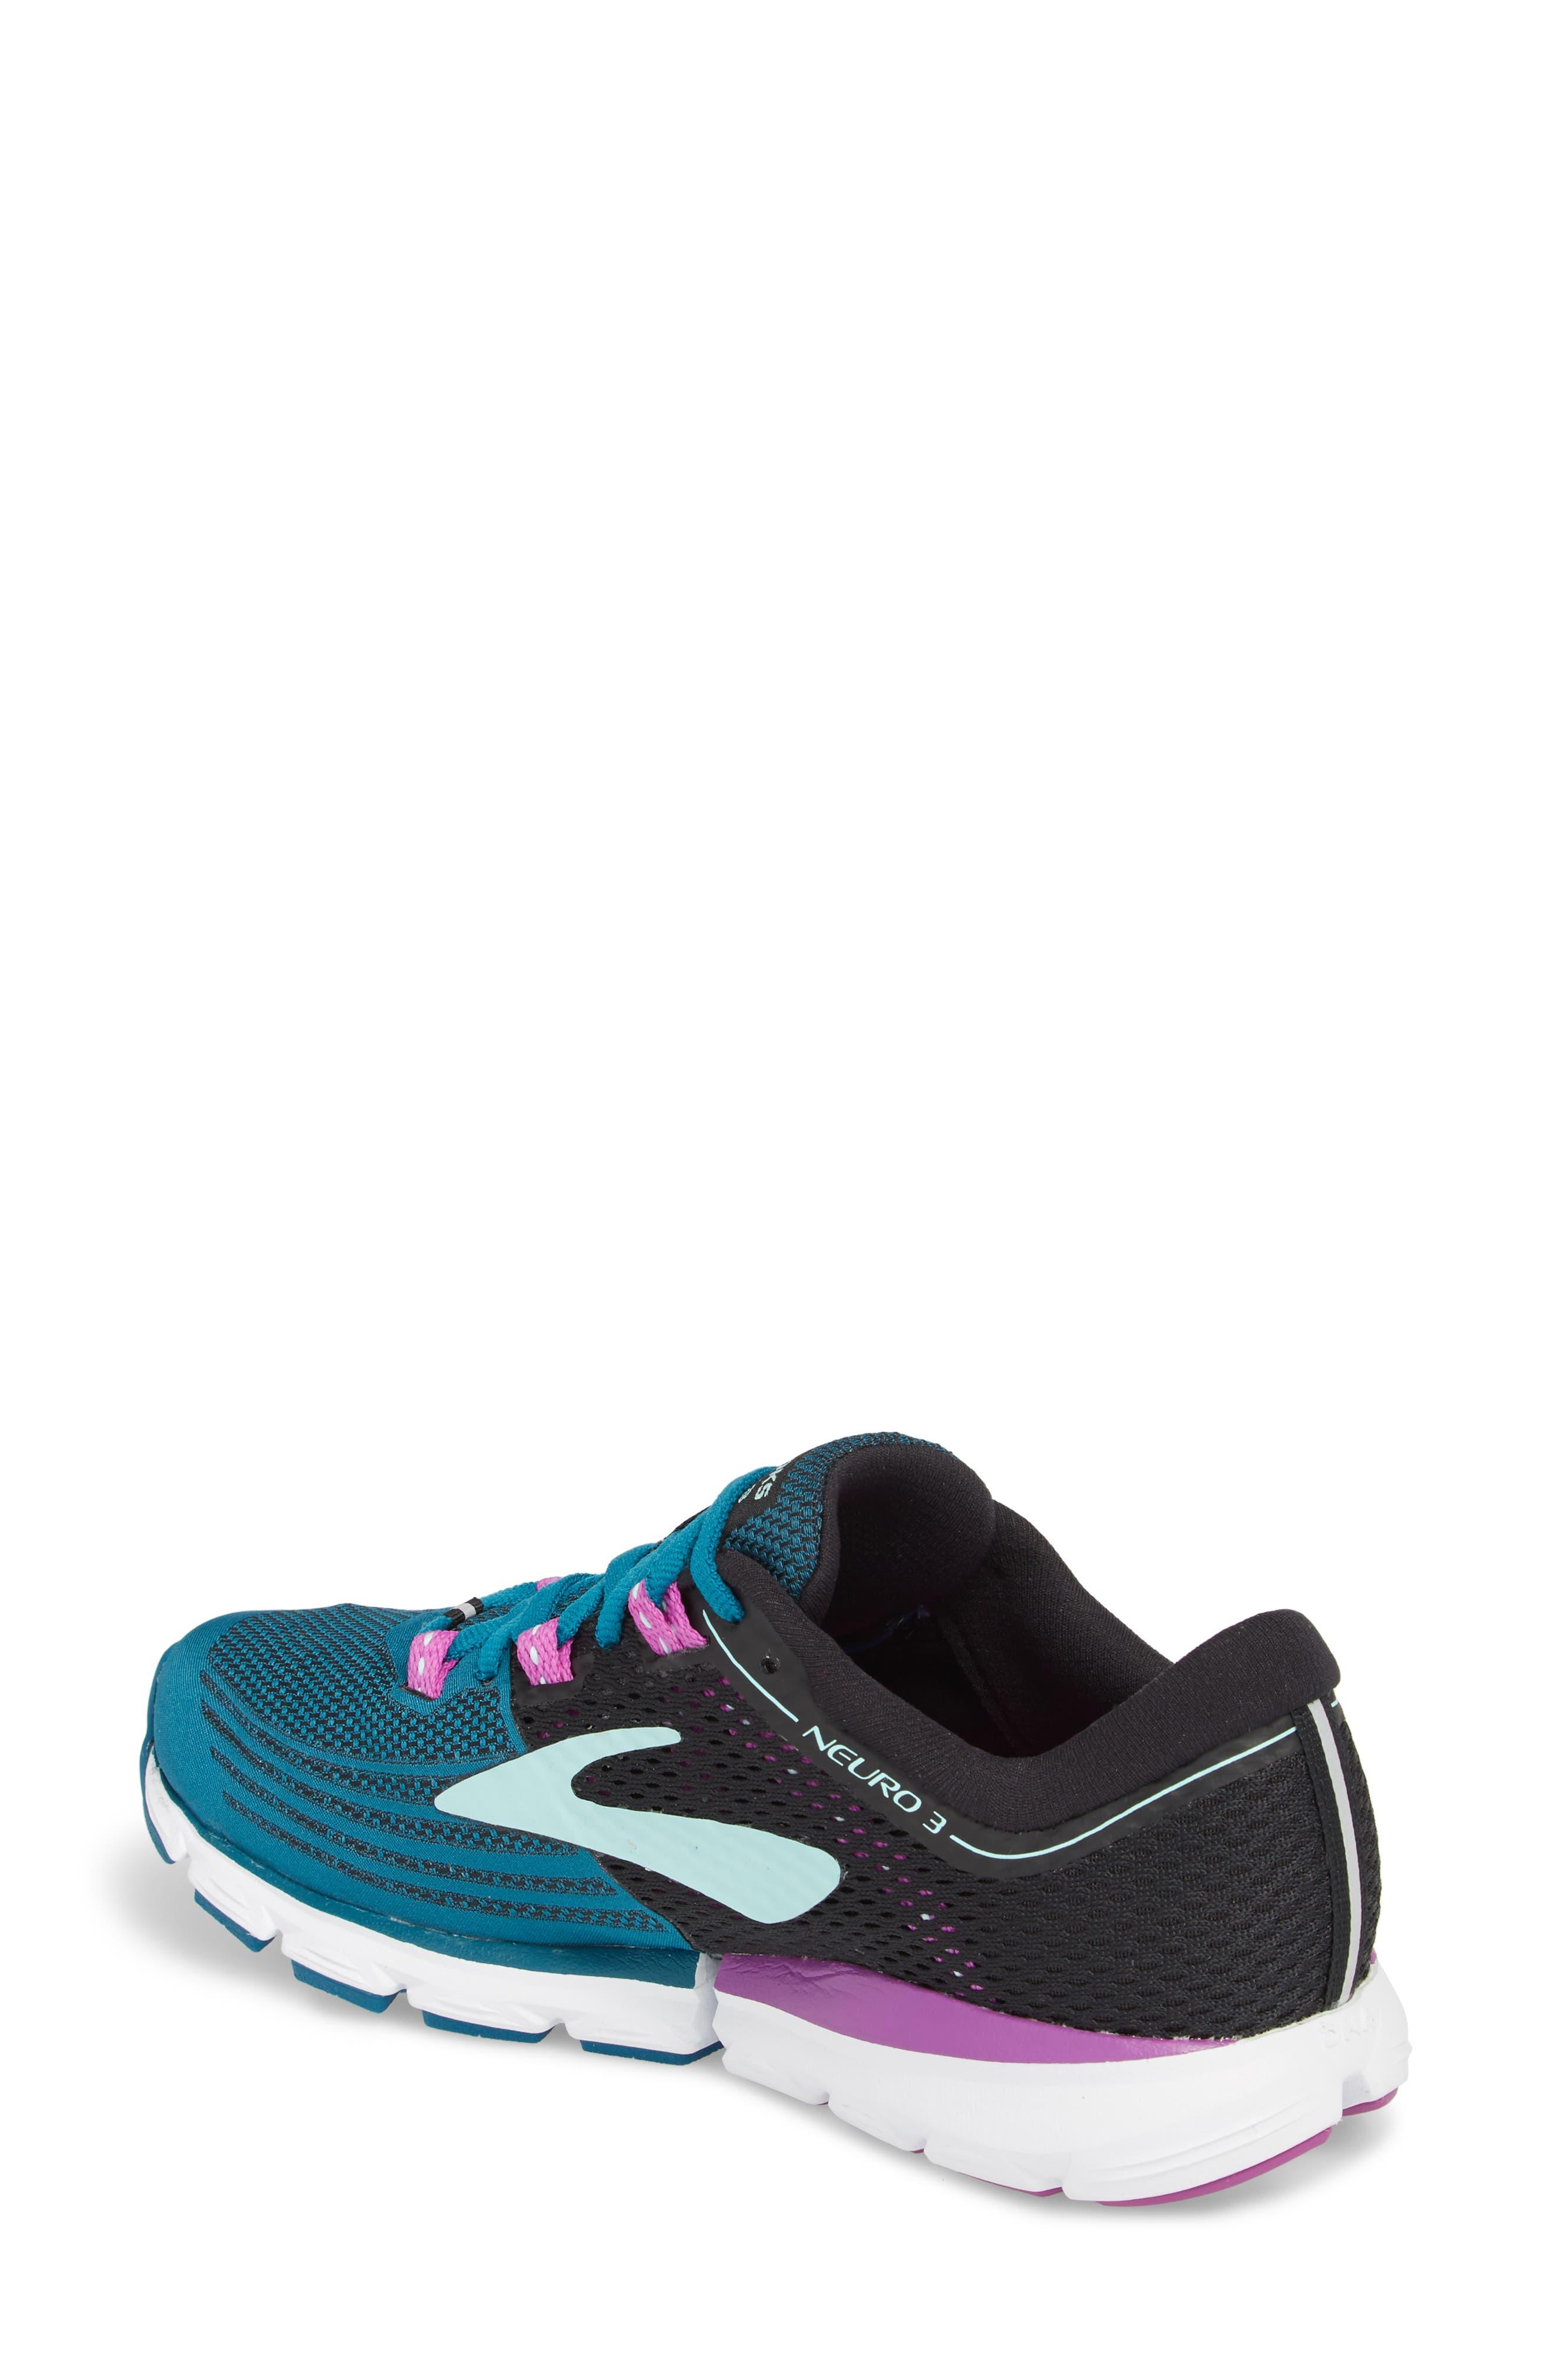 Neuro 3 Running Shoe,                             Alternate thumbnail 2, color,                             Lagoon/ Black/ Purple